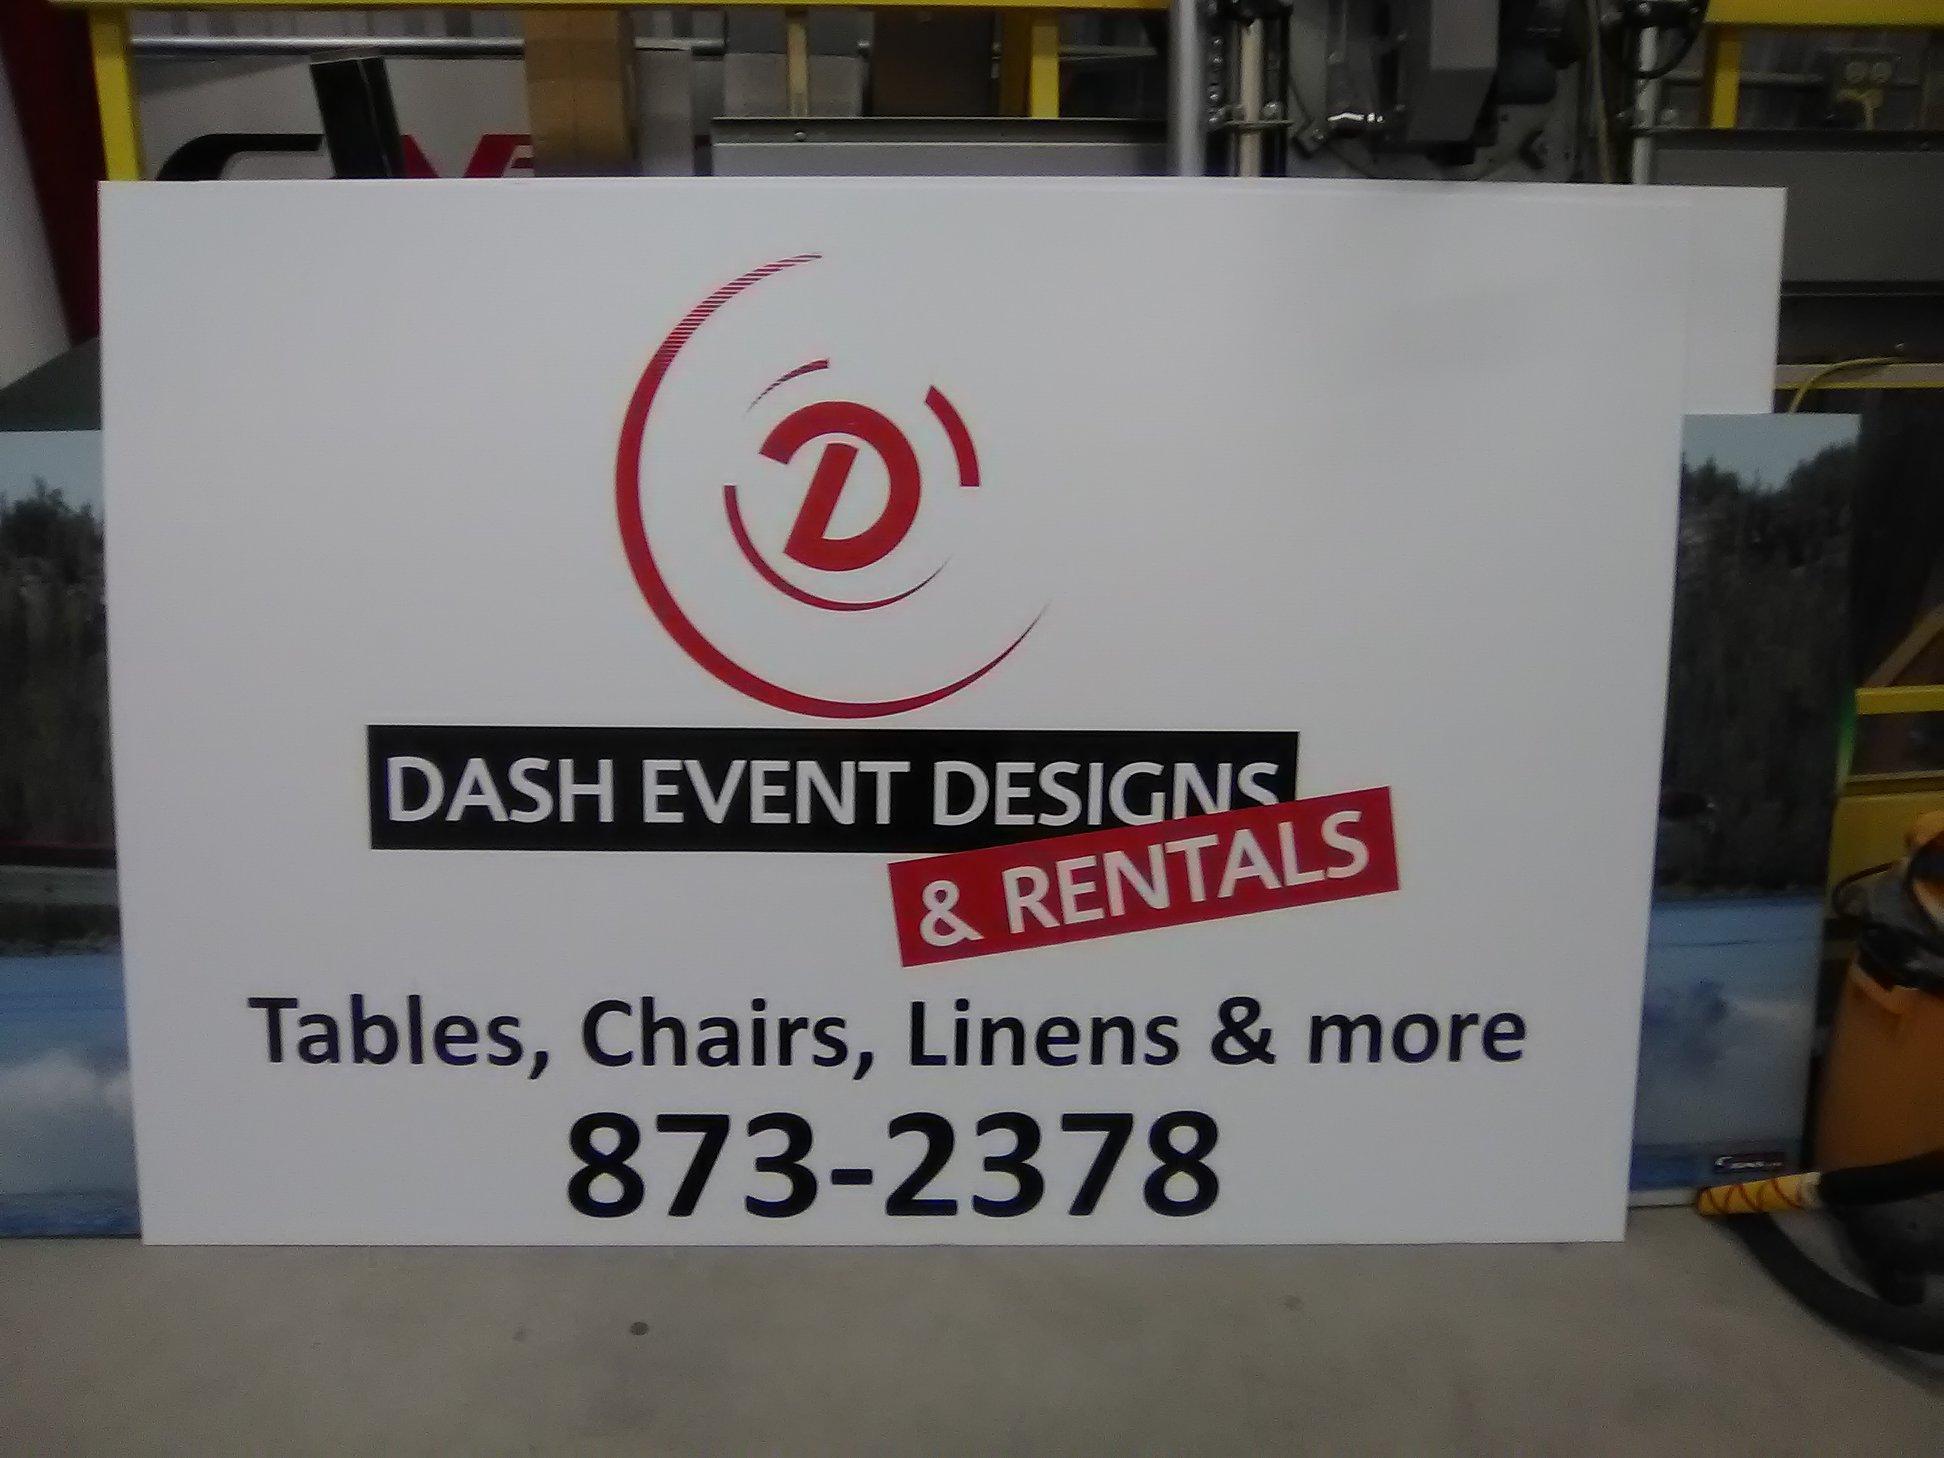 Dash Event Designs & Rentals